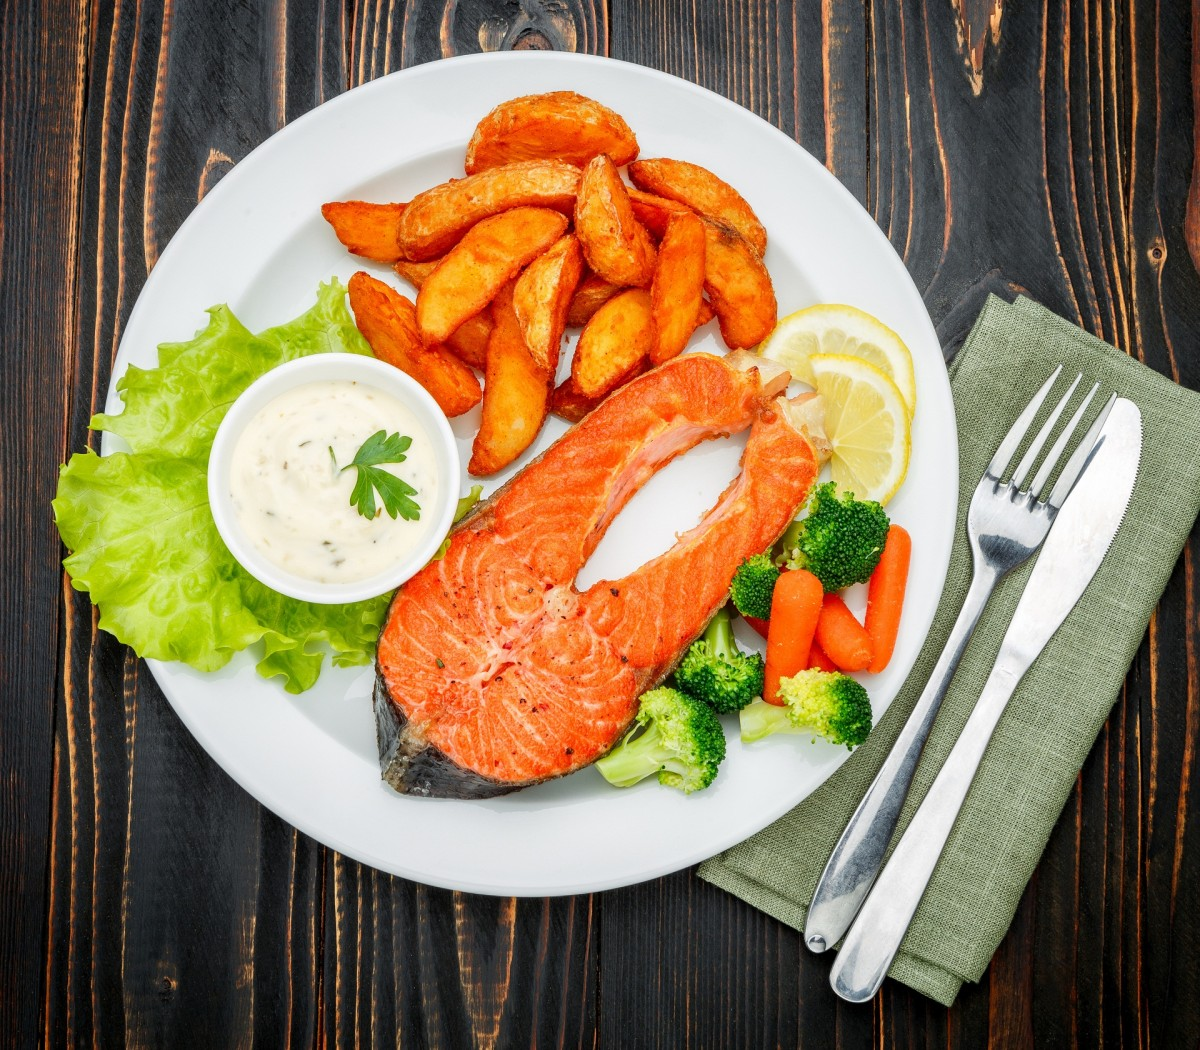 Rompecabezas Fish and potatoes